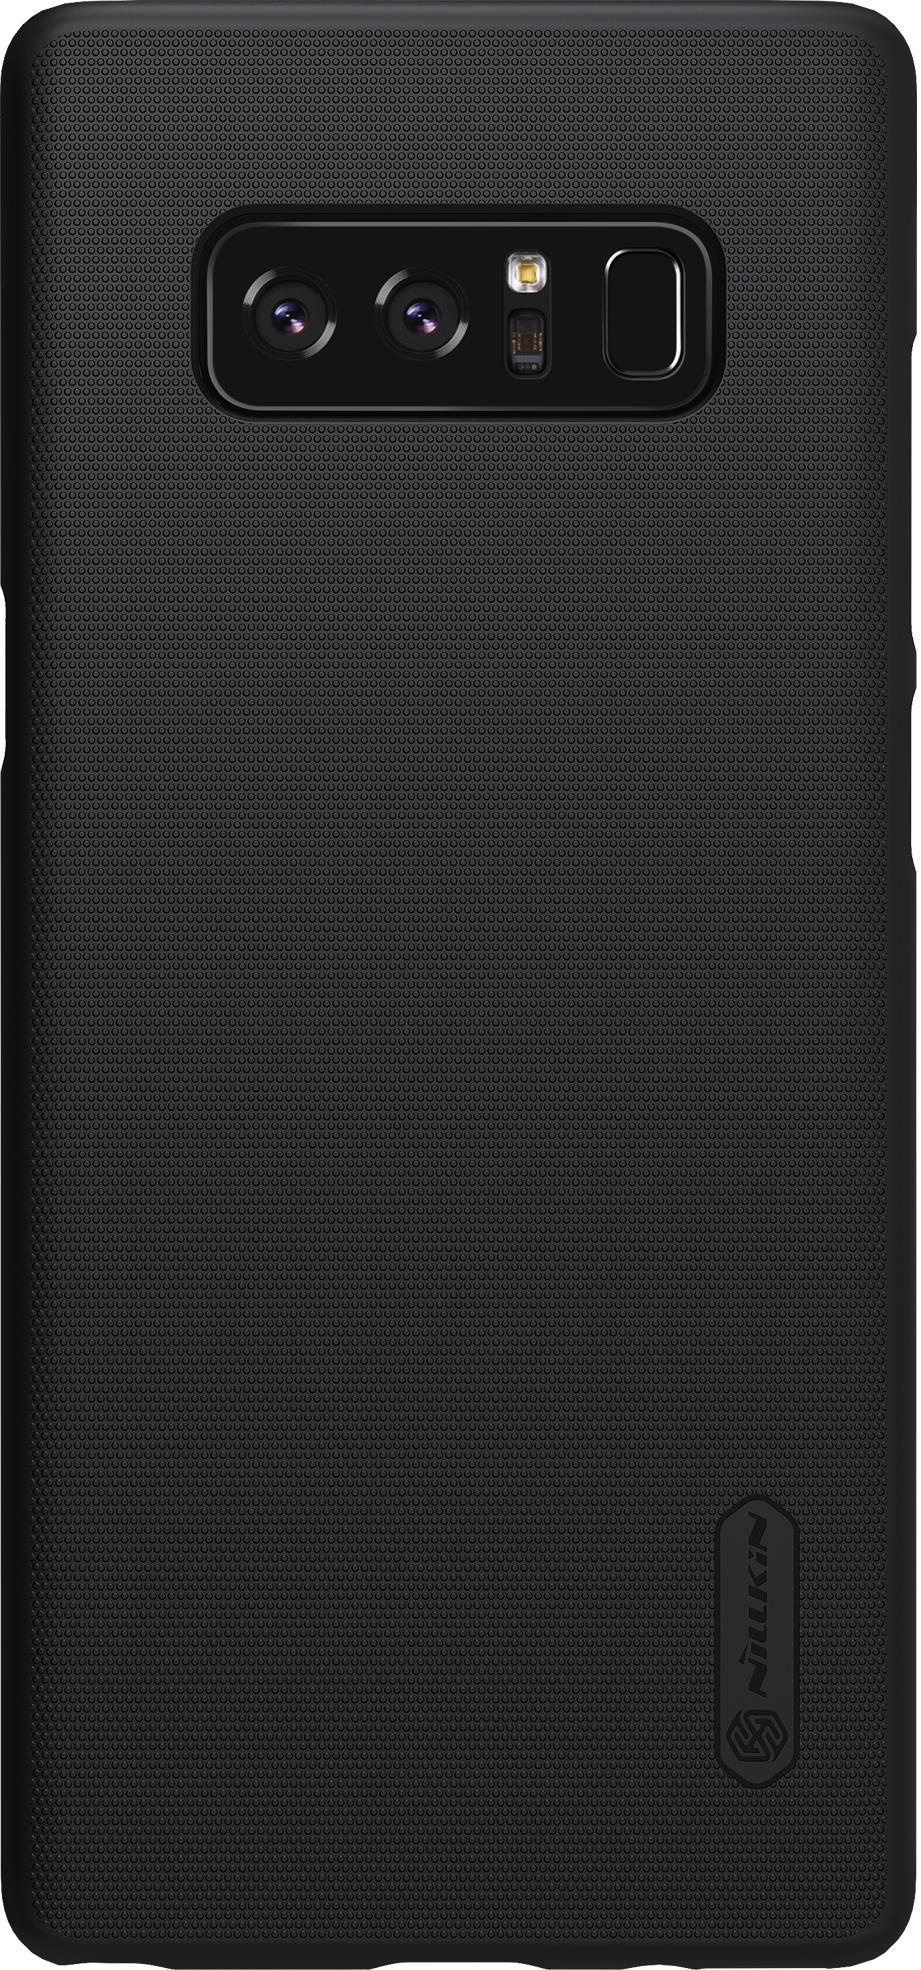 Чехол для сотового телефона Nillkin T-N-SGN8-002, черный накладка nillkin super frosted shield для samsung galaxy mega 6 3